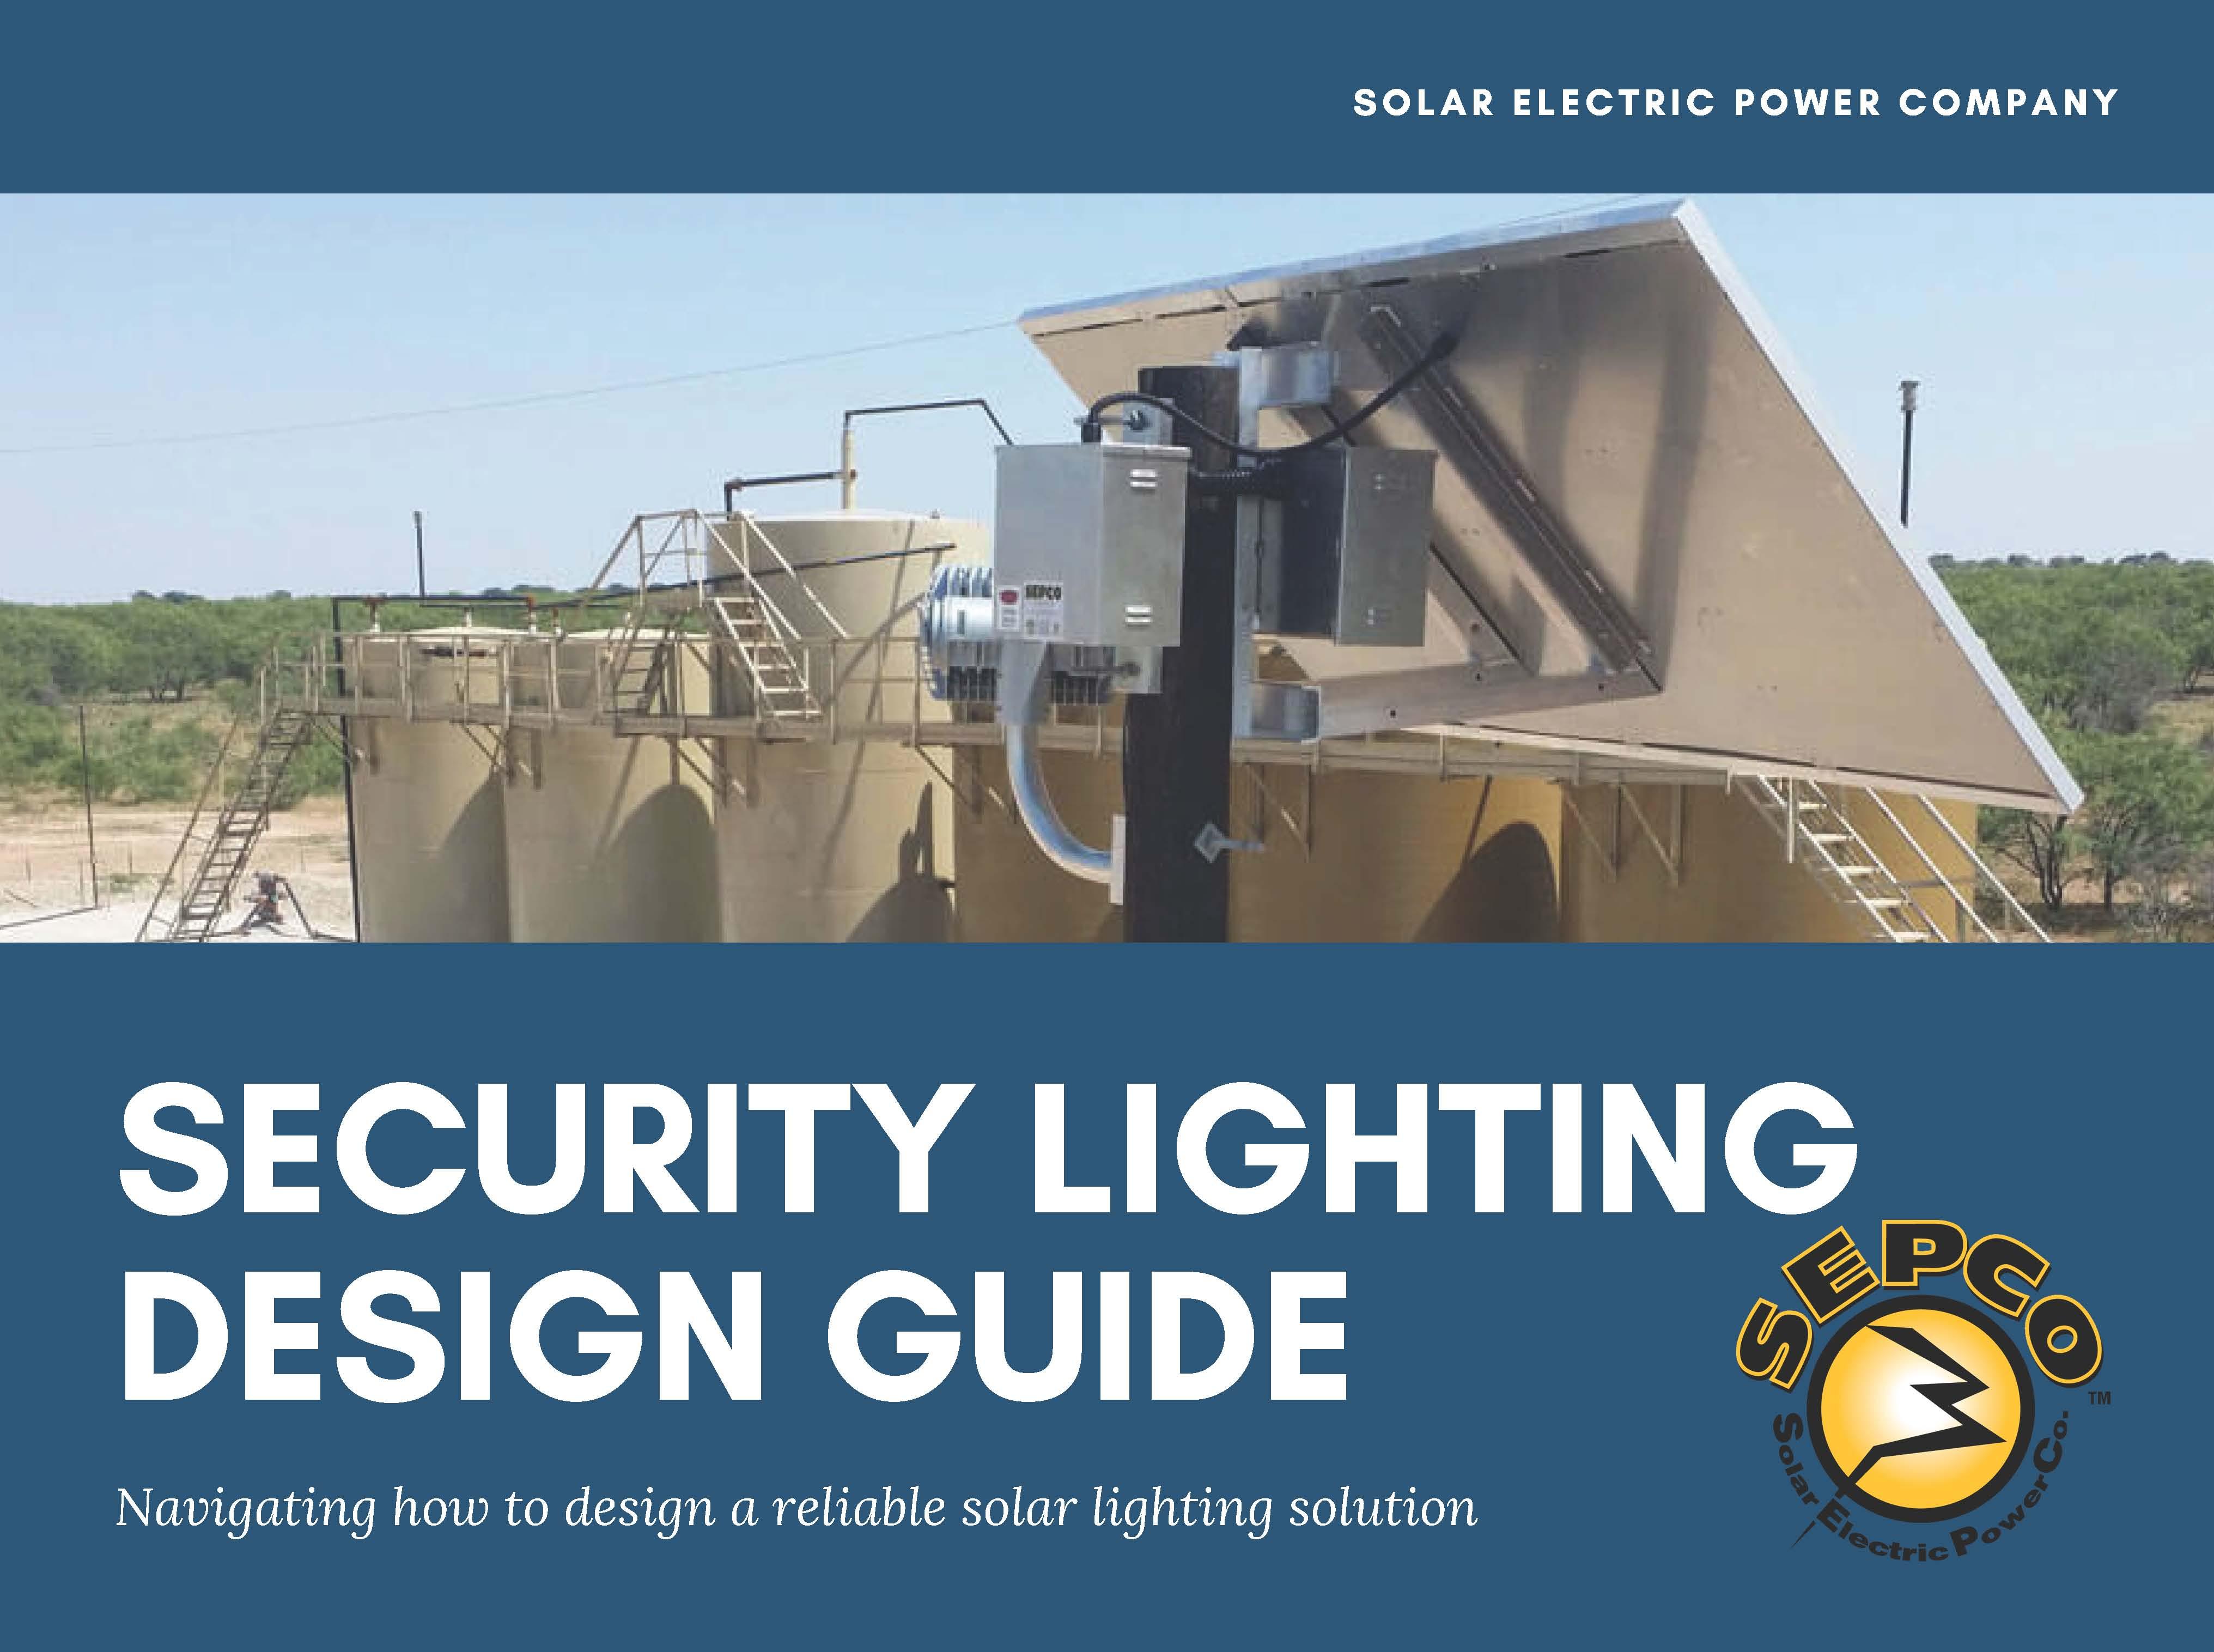 Security Lighting Design Guide